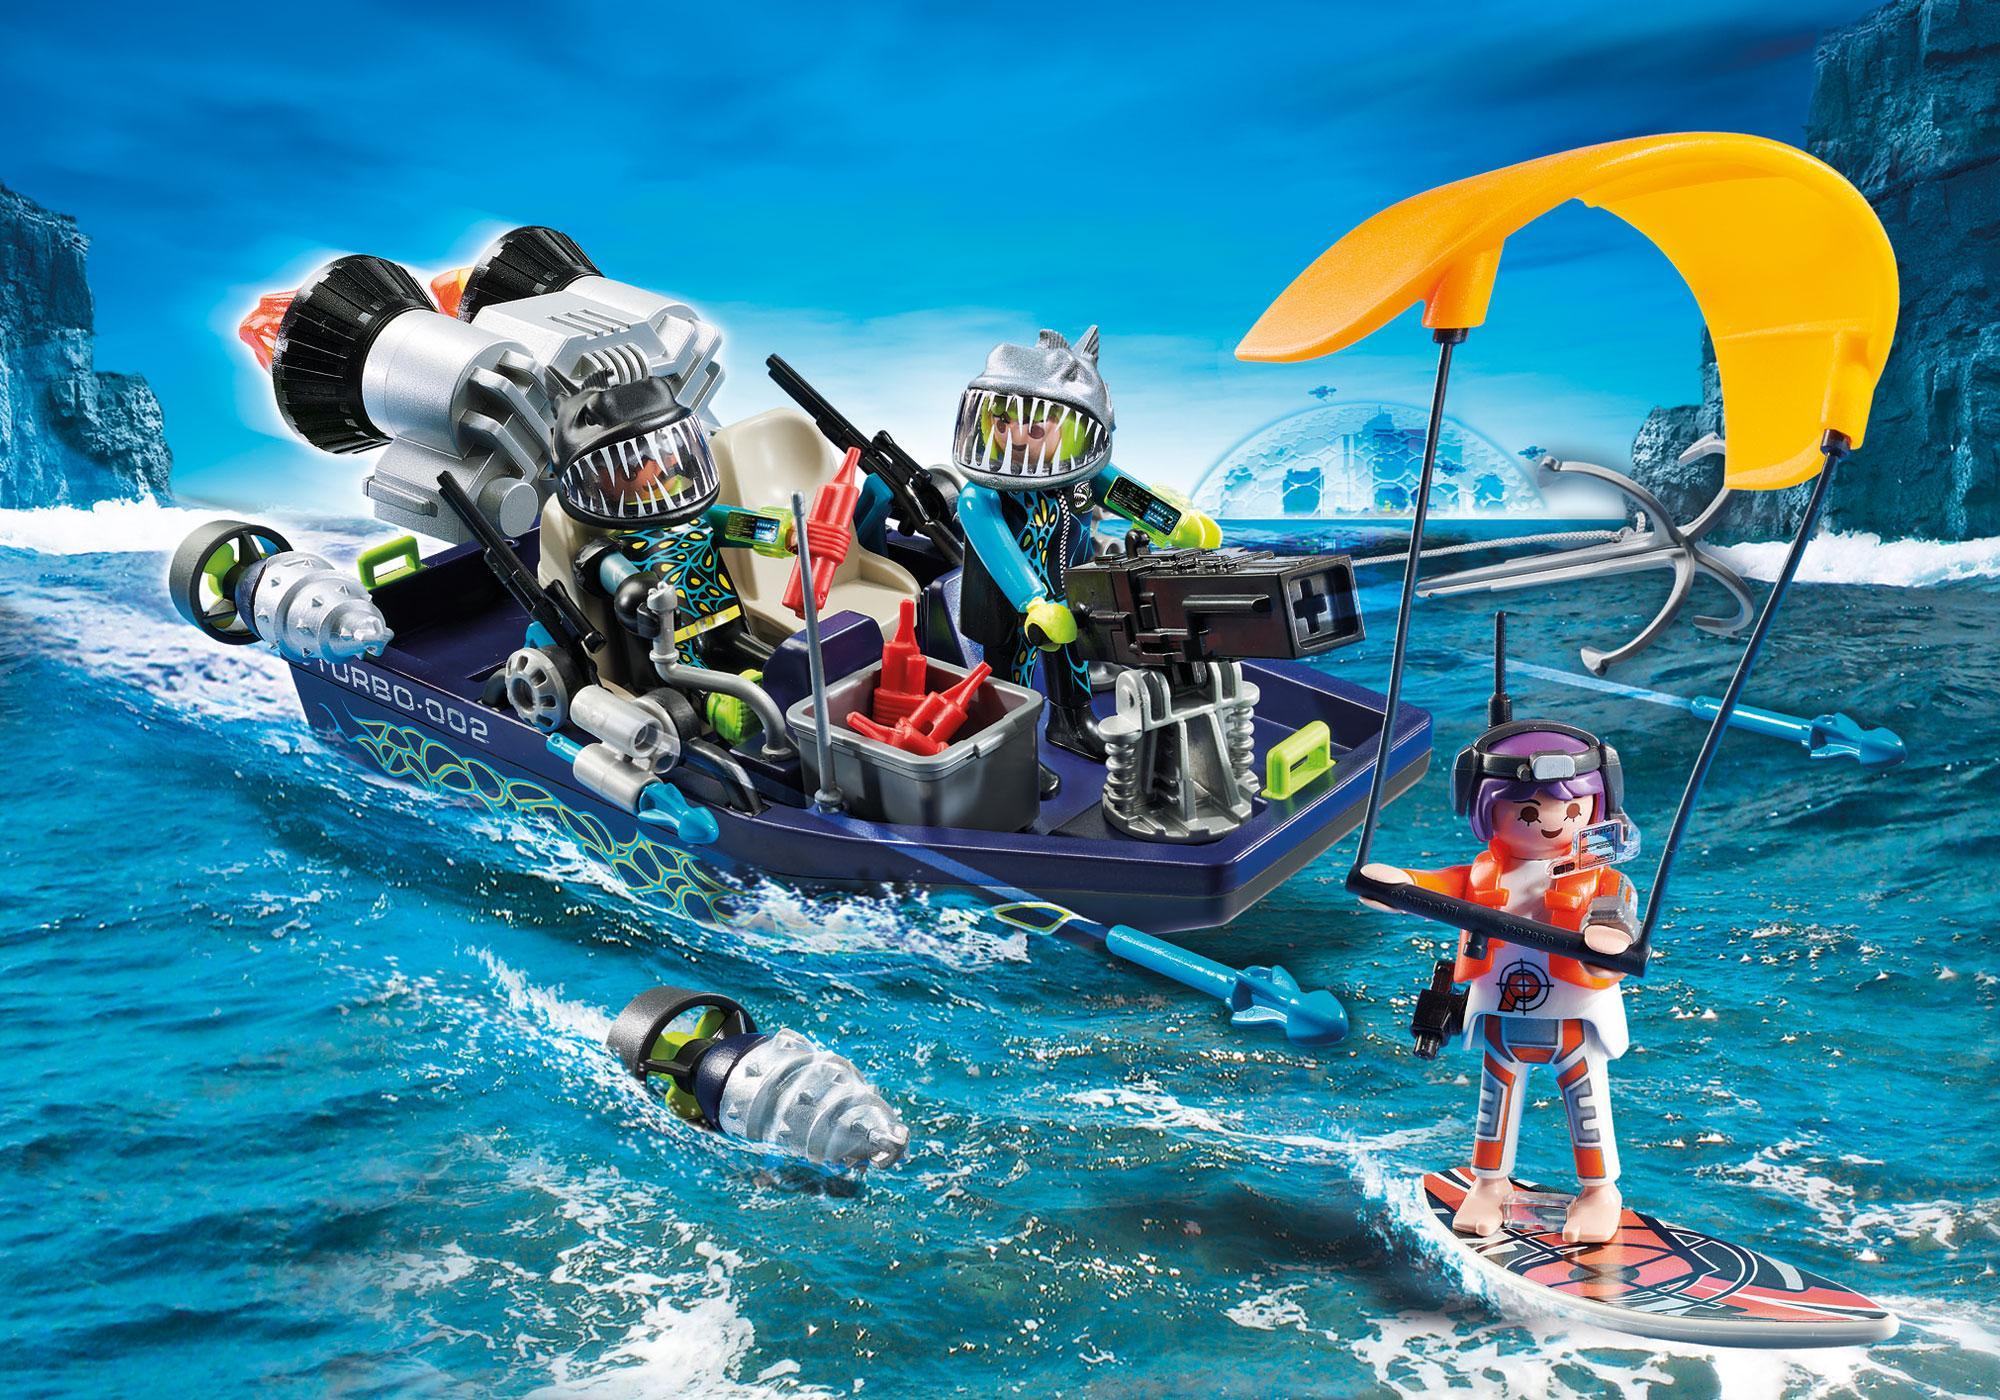 http://media.playmobil.com/i/playmobil/70006_product_detail/TEAM S.H.A.R.K. Harpoon Craft